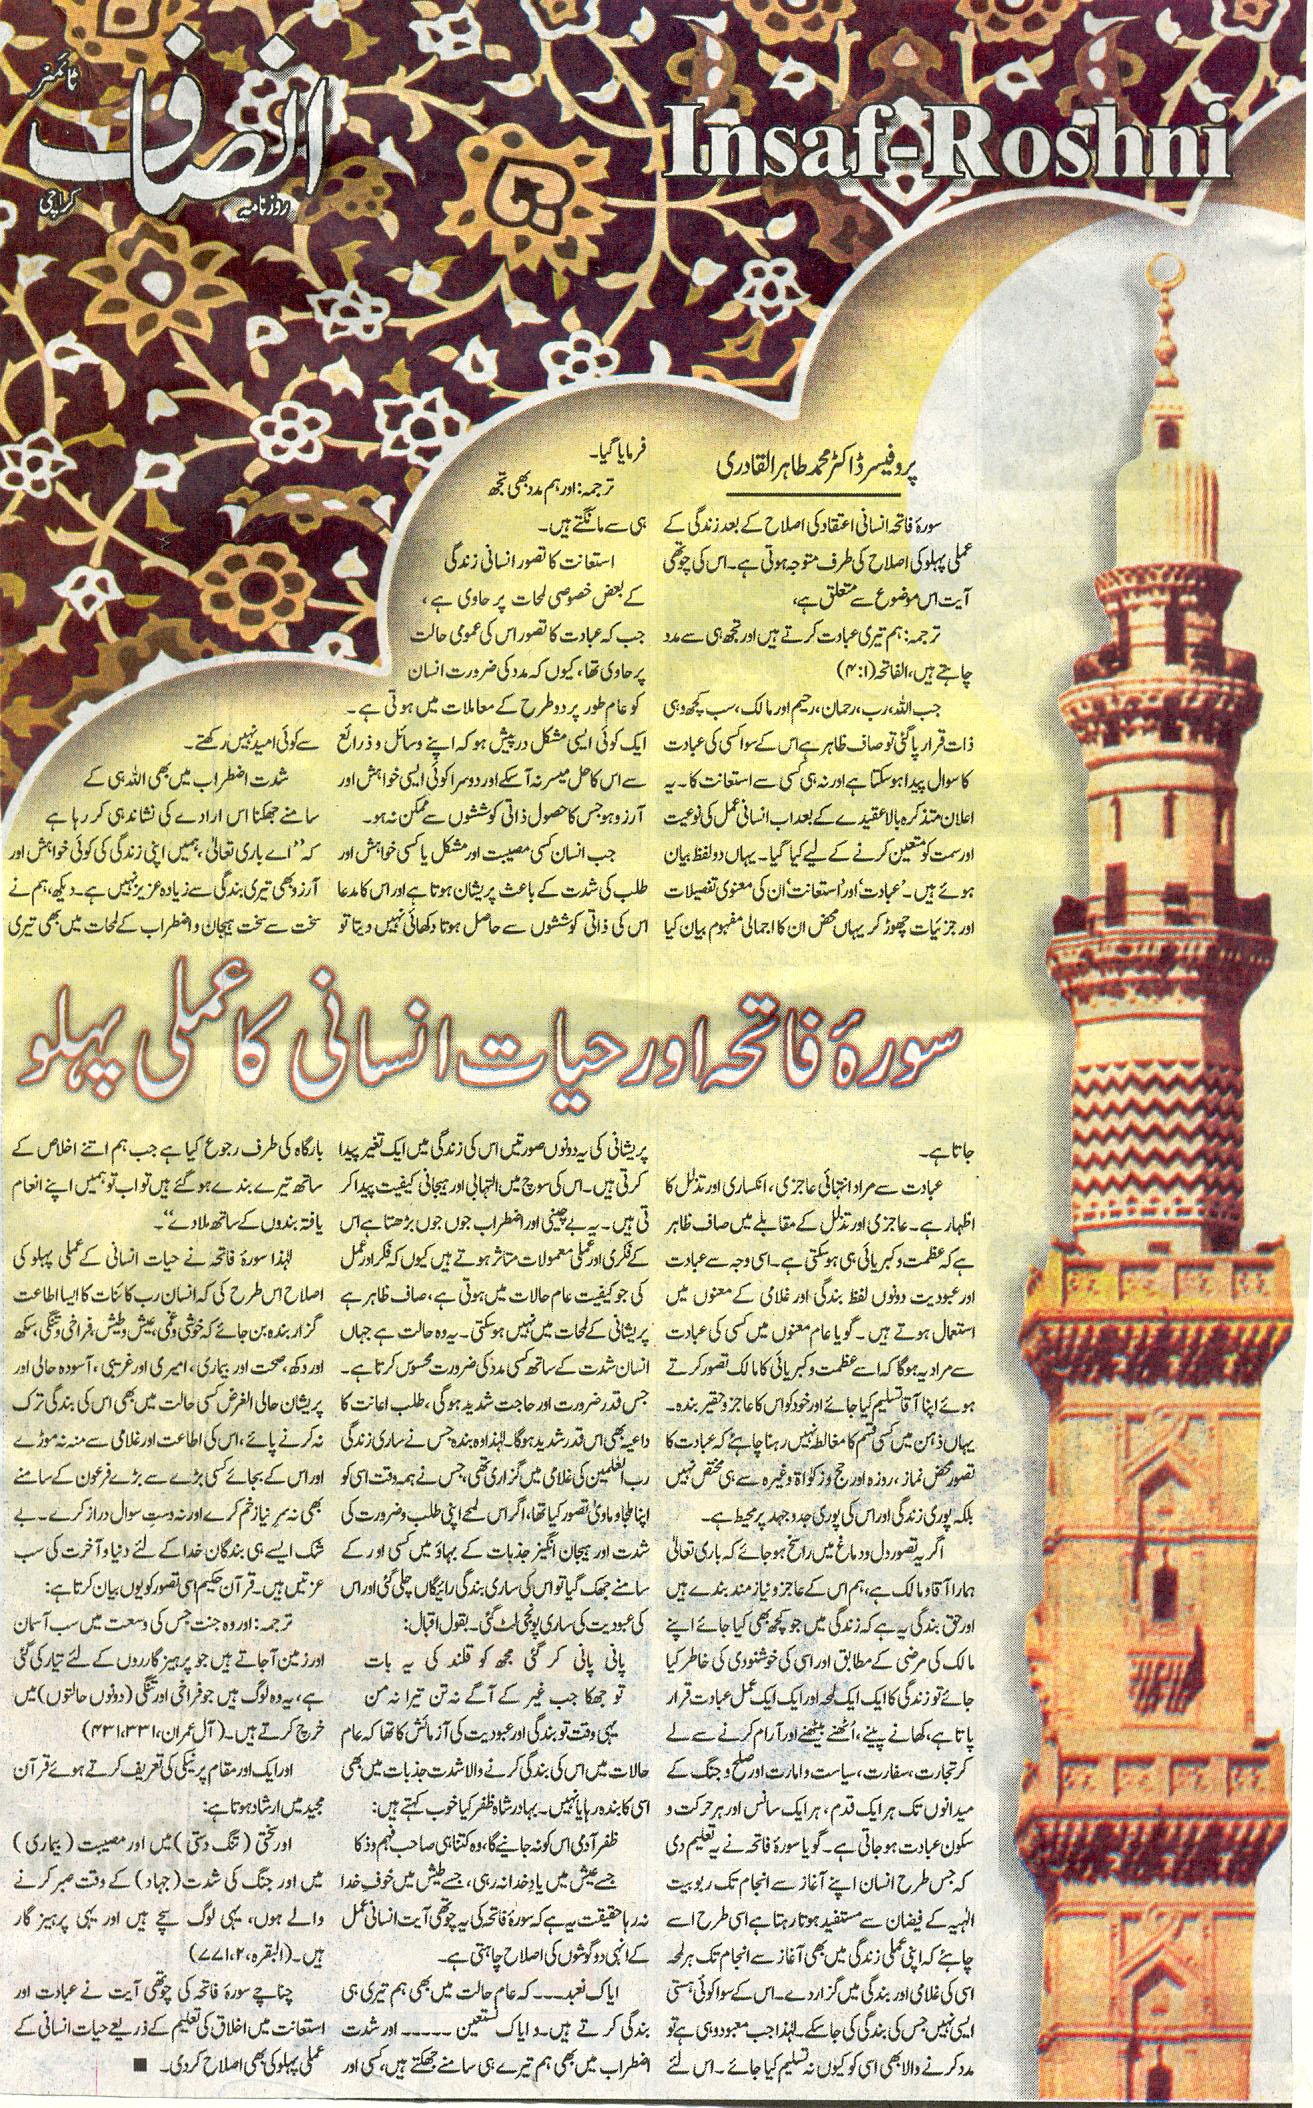 تحریک منہاج القرآن Minhaj-ul-Quran  Print Media Coverage پرنٹ میڈیا کوریج Daily Insaf Times